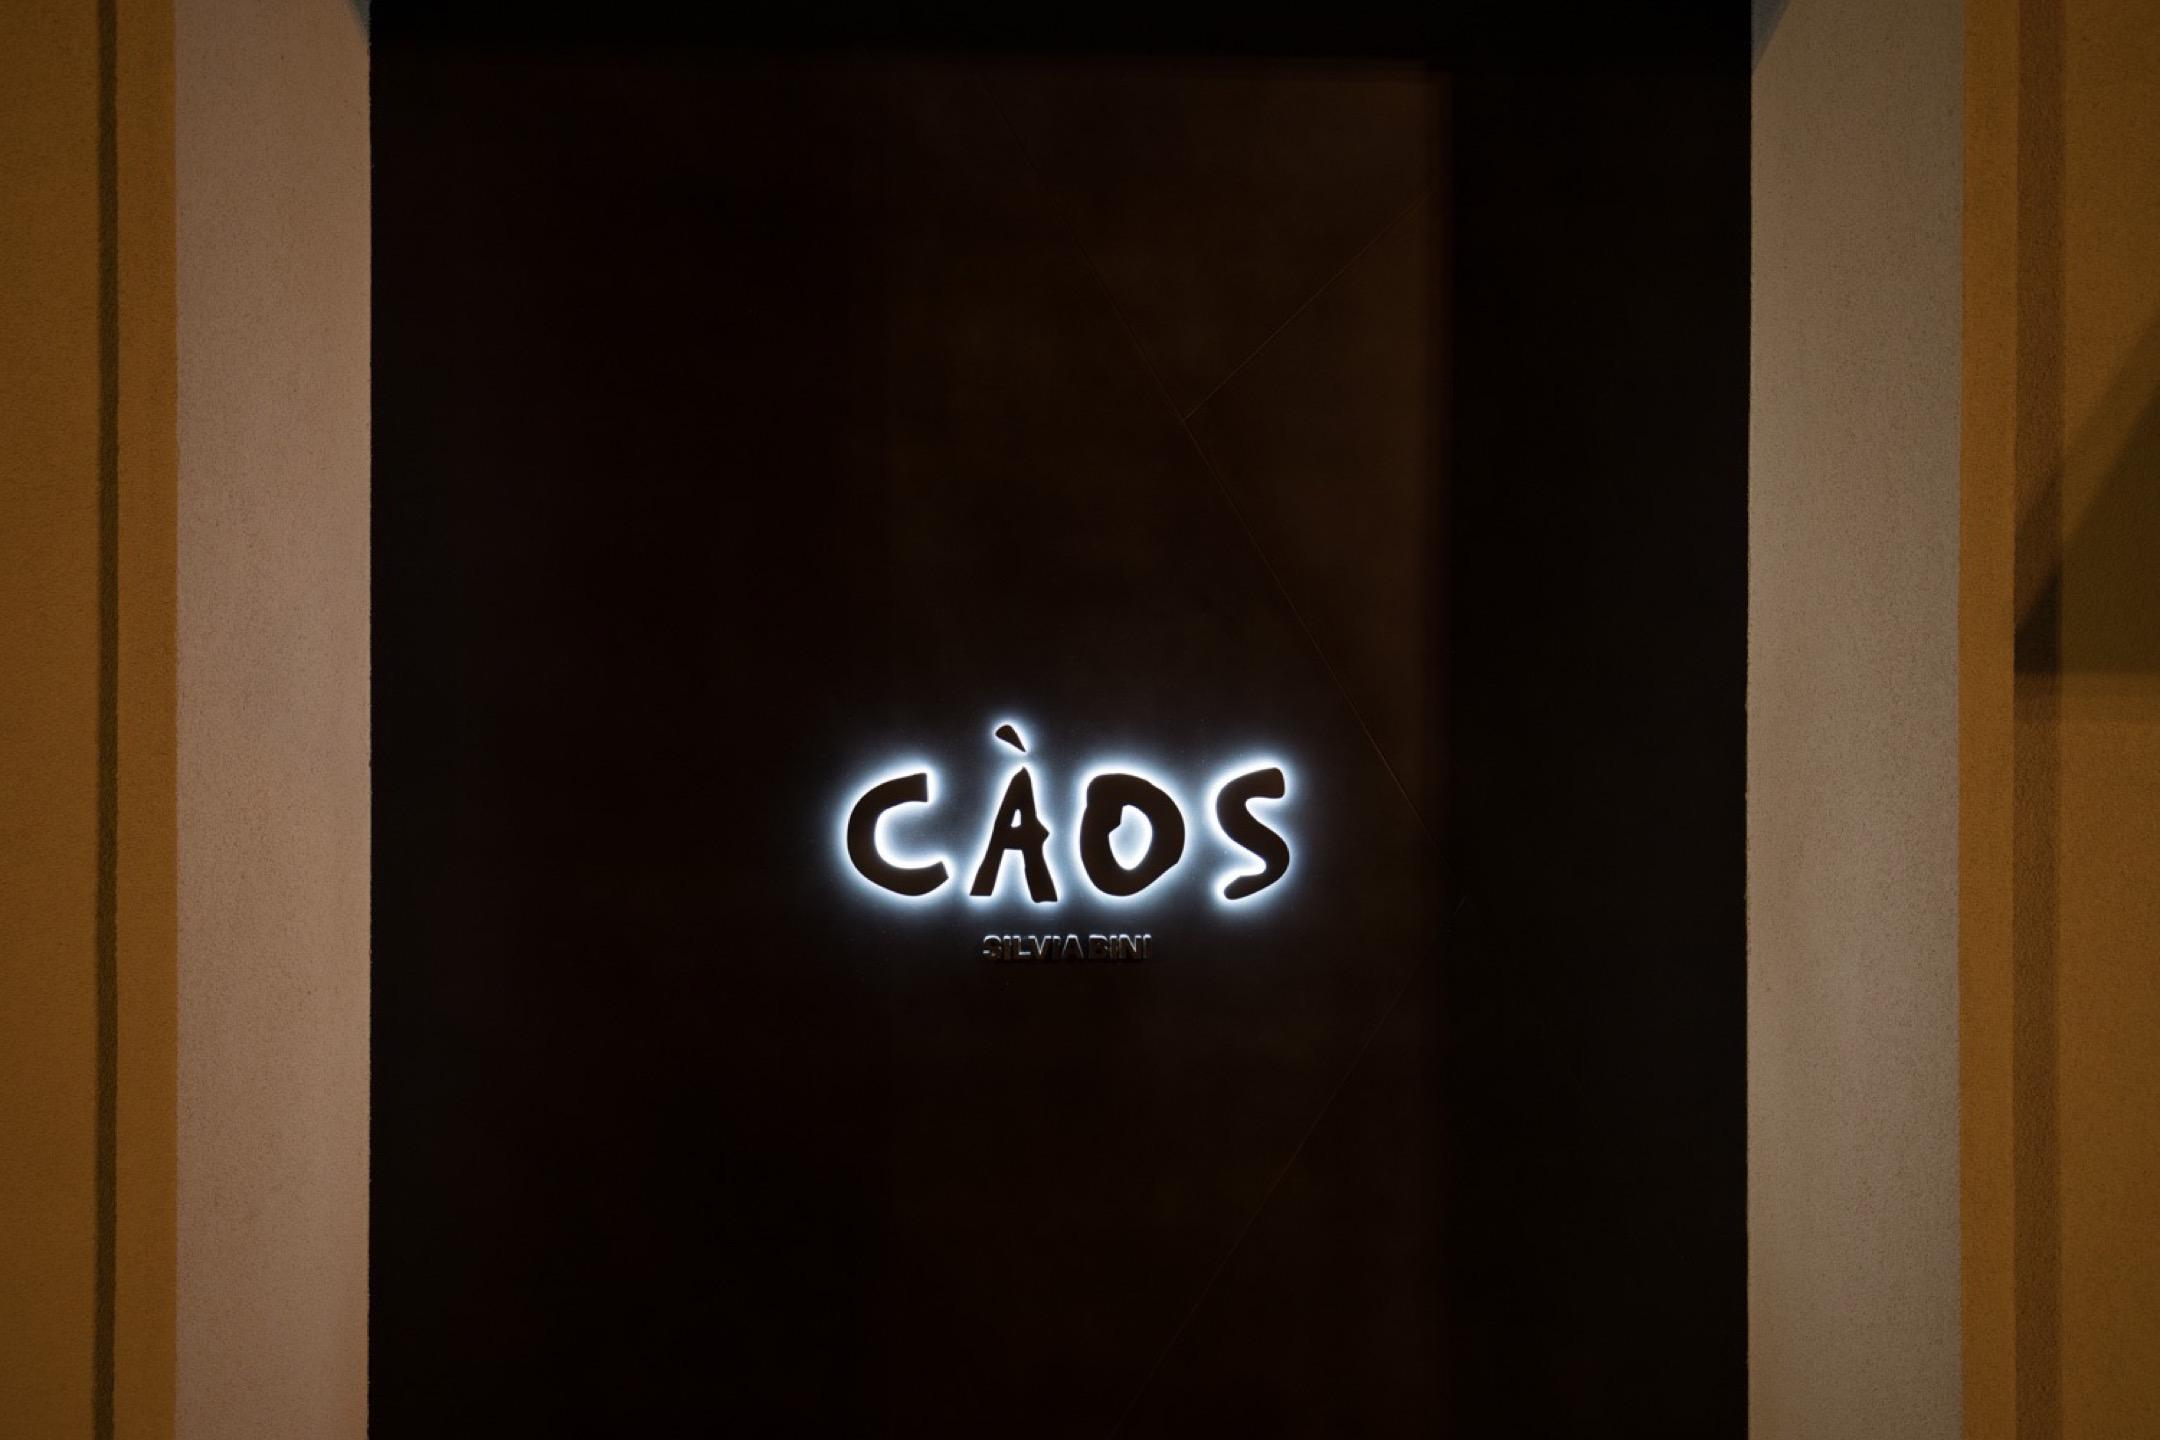 Càos by Silvia Bini Opening